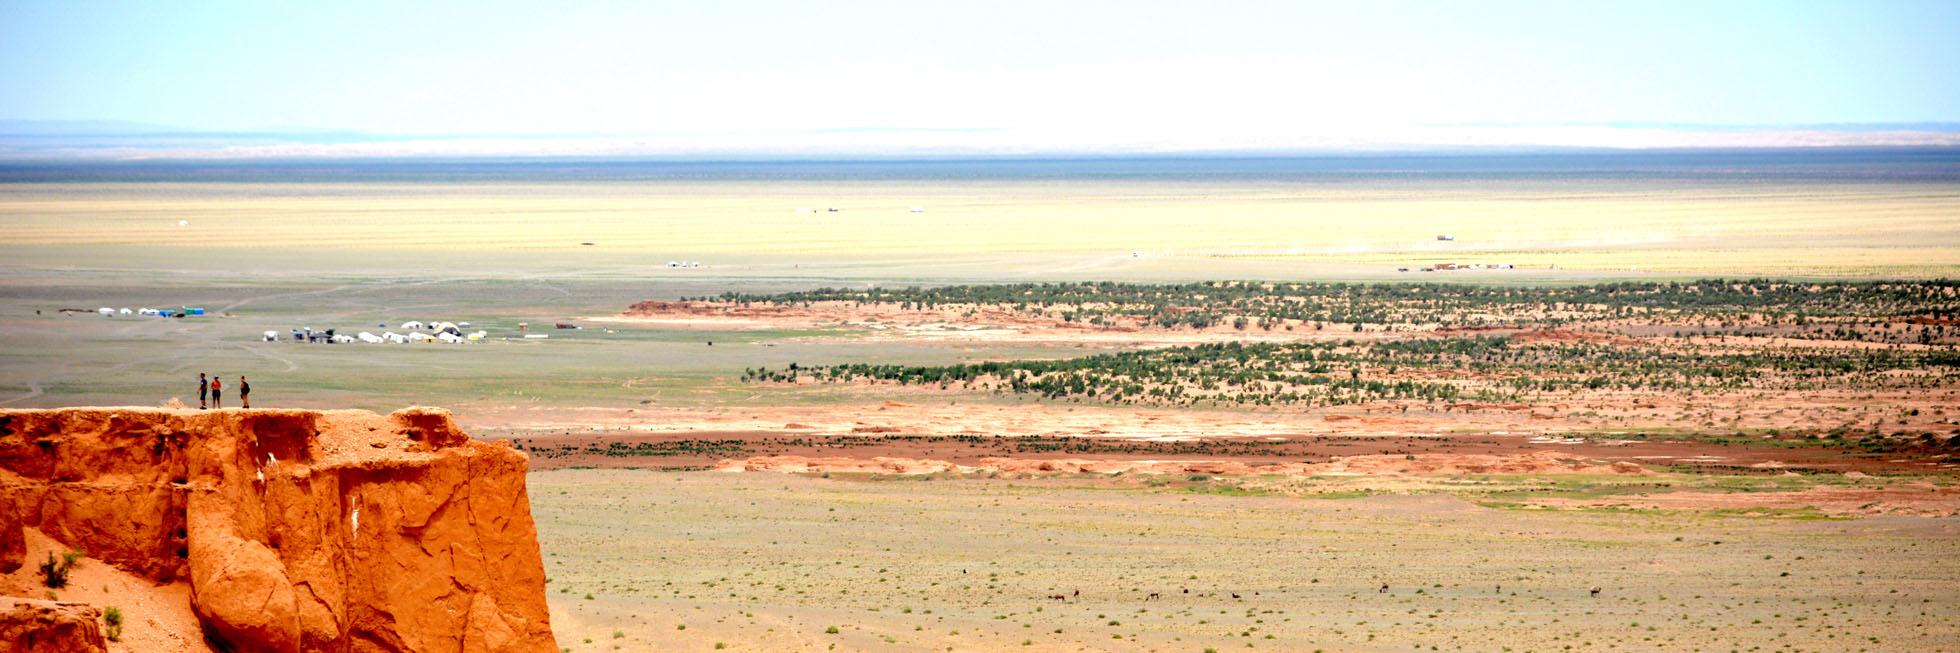 Bajandsag Flammende Klippen in wüste gobi